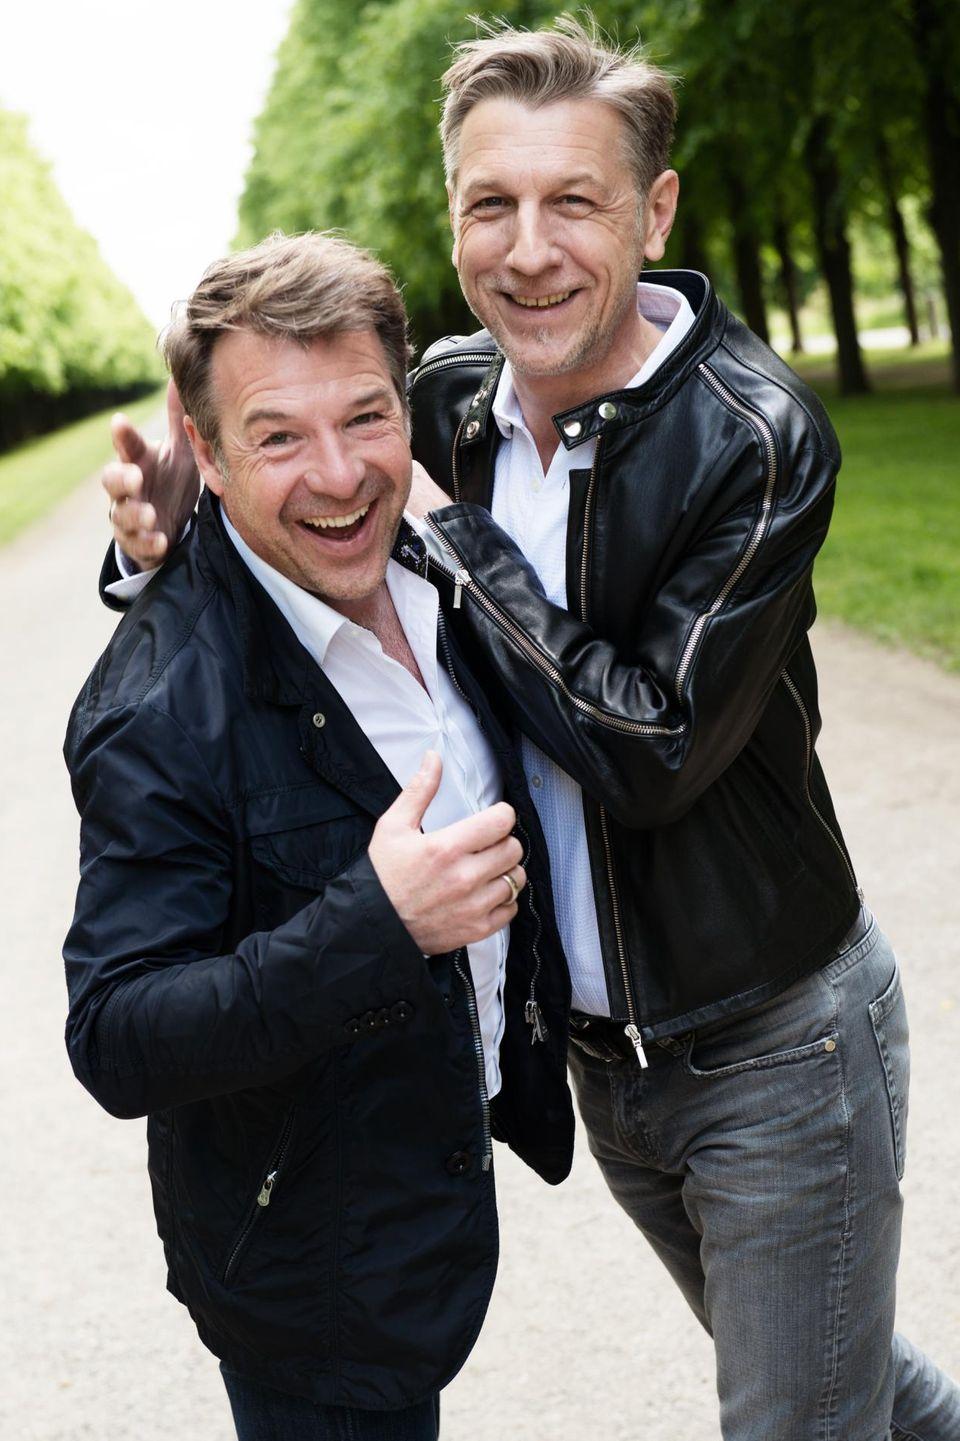 Patrick Lindner, Peter Schäfer